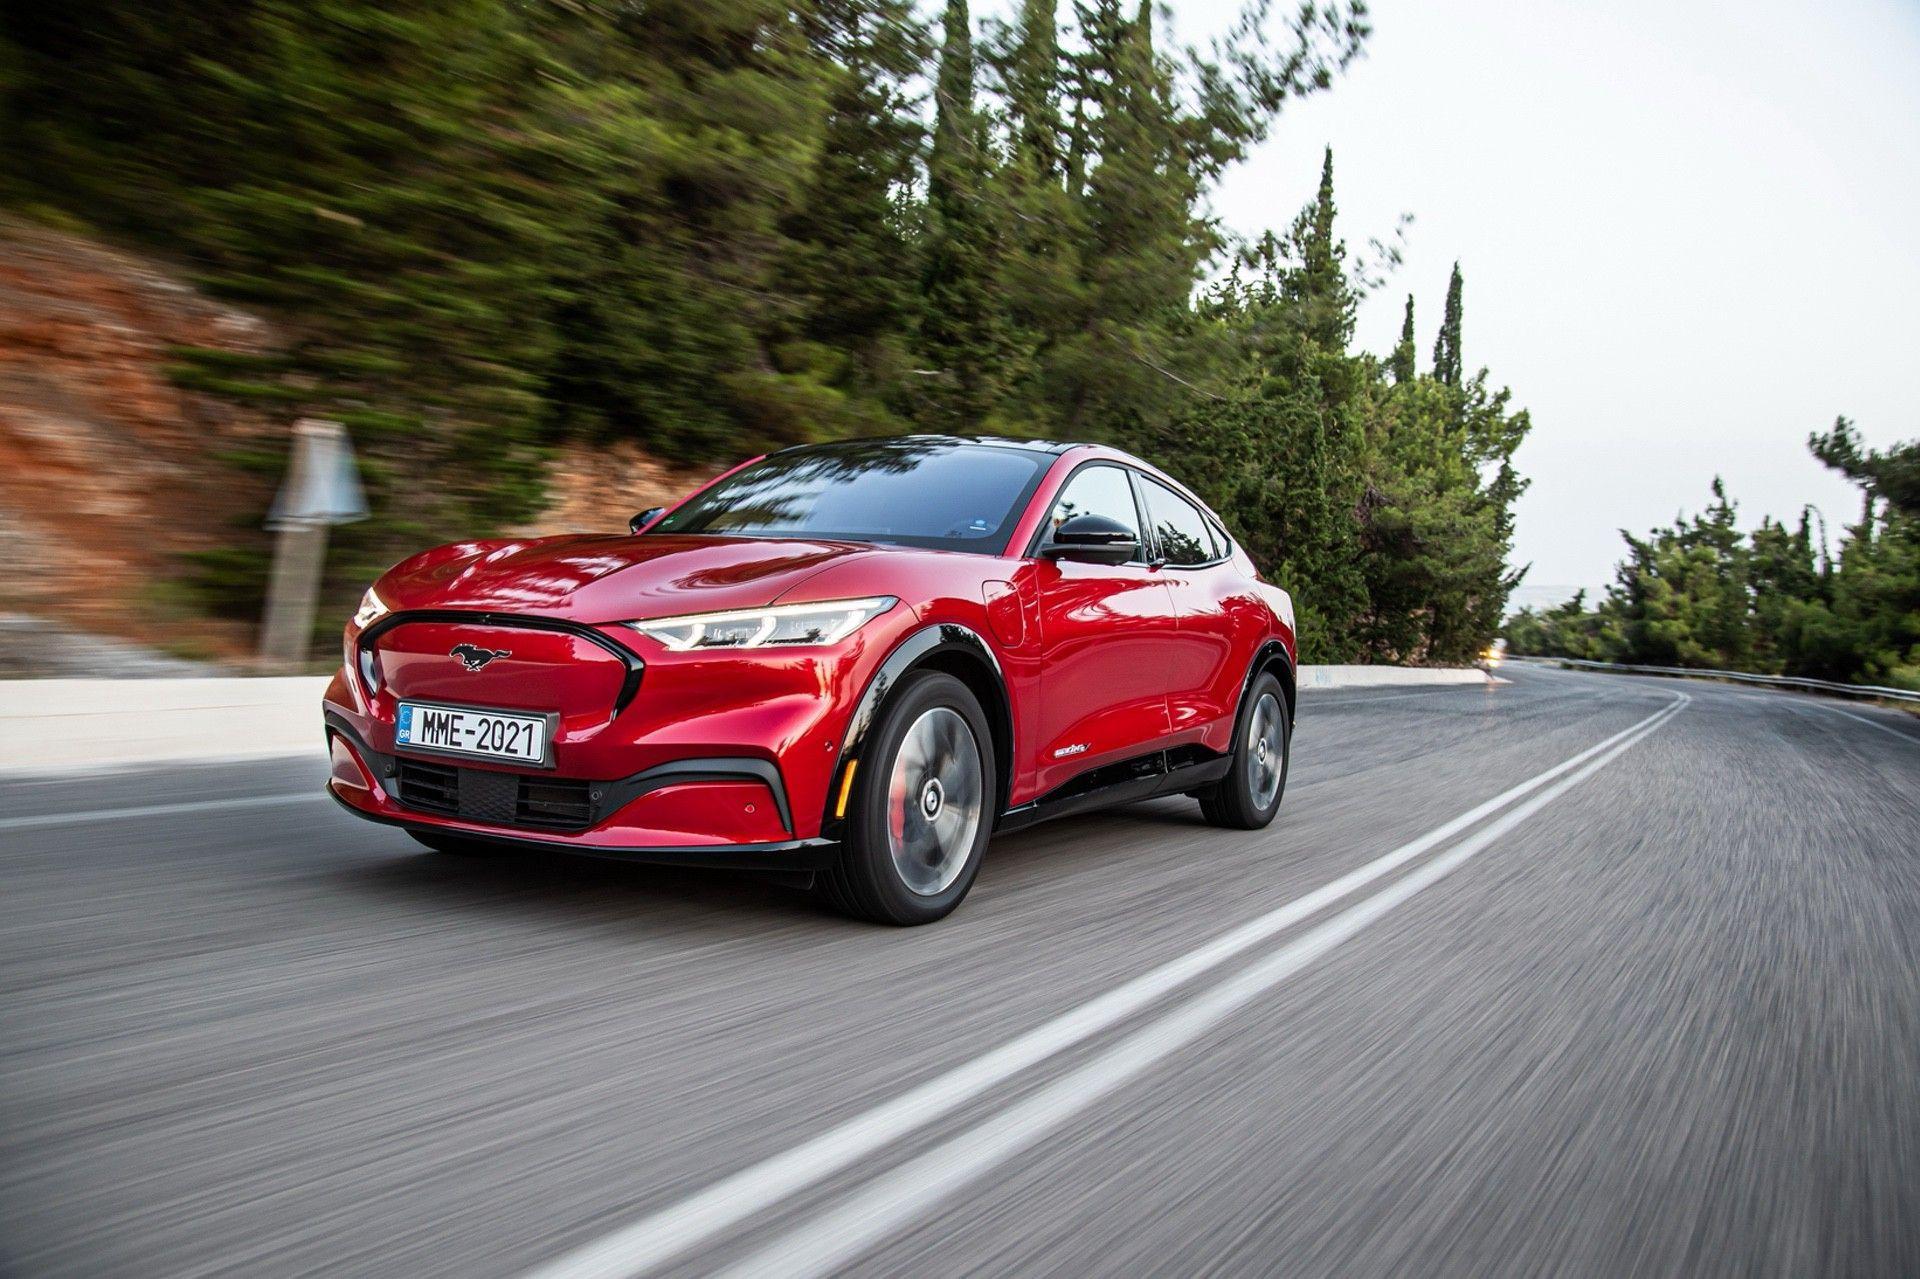 Ford_Mustang_Mach-E_greek_presskit-0091